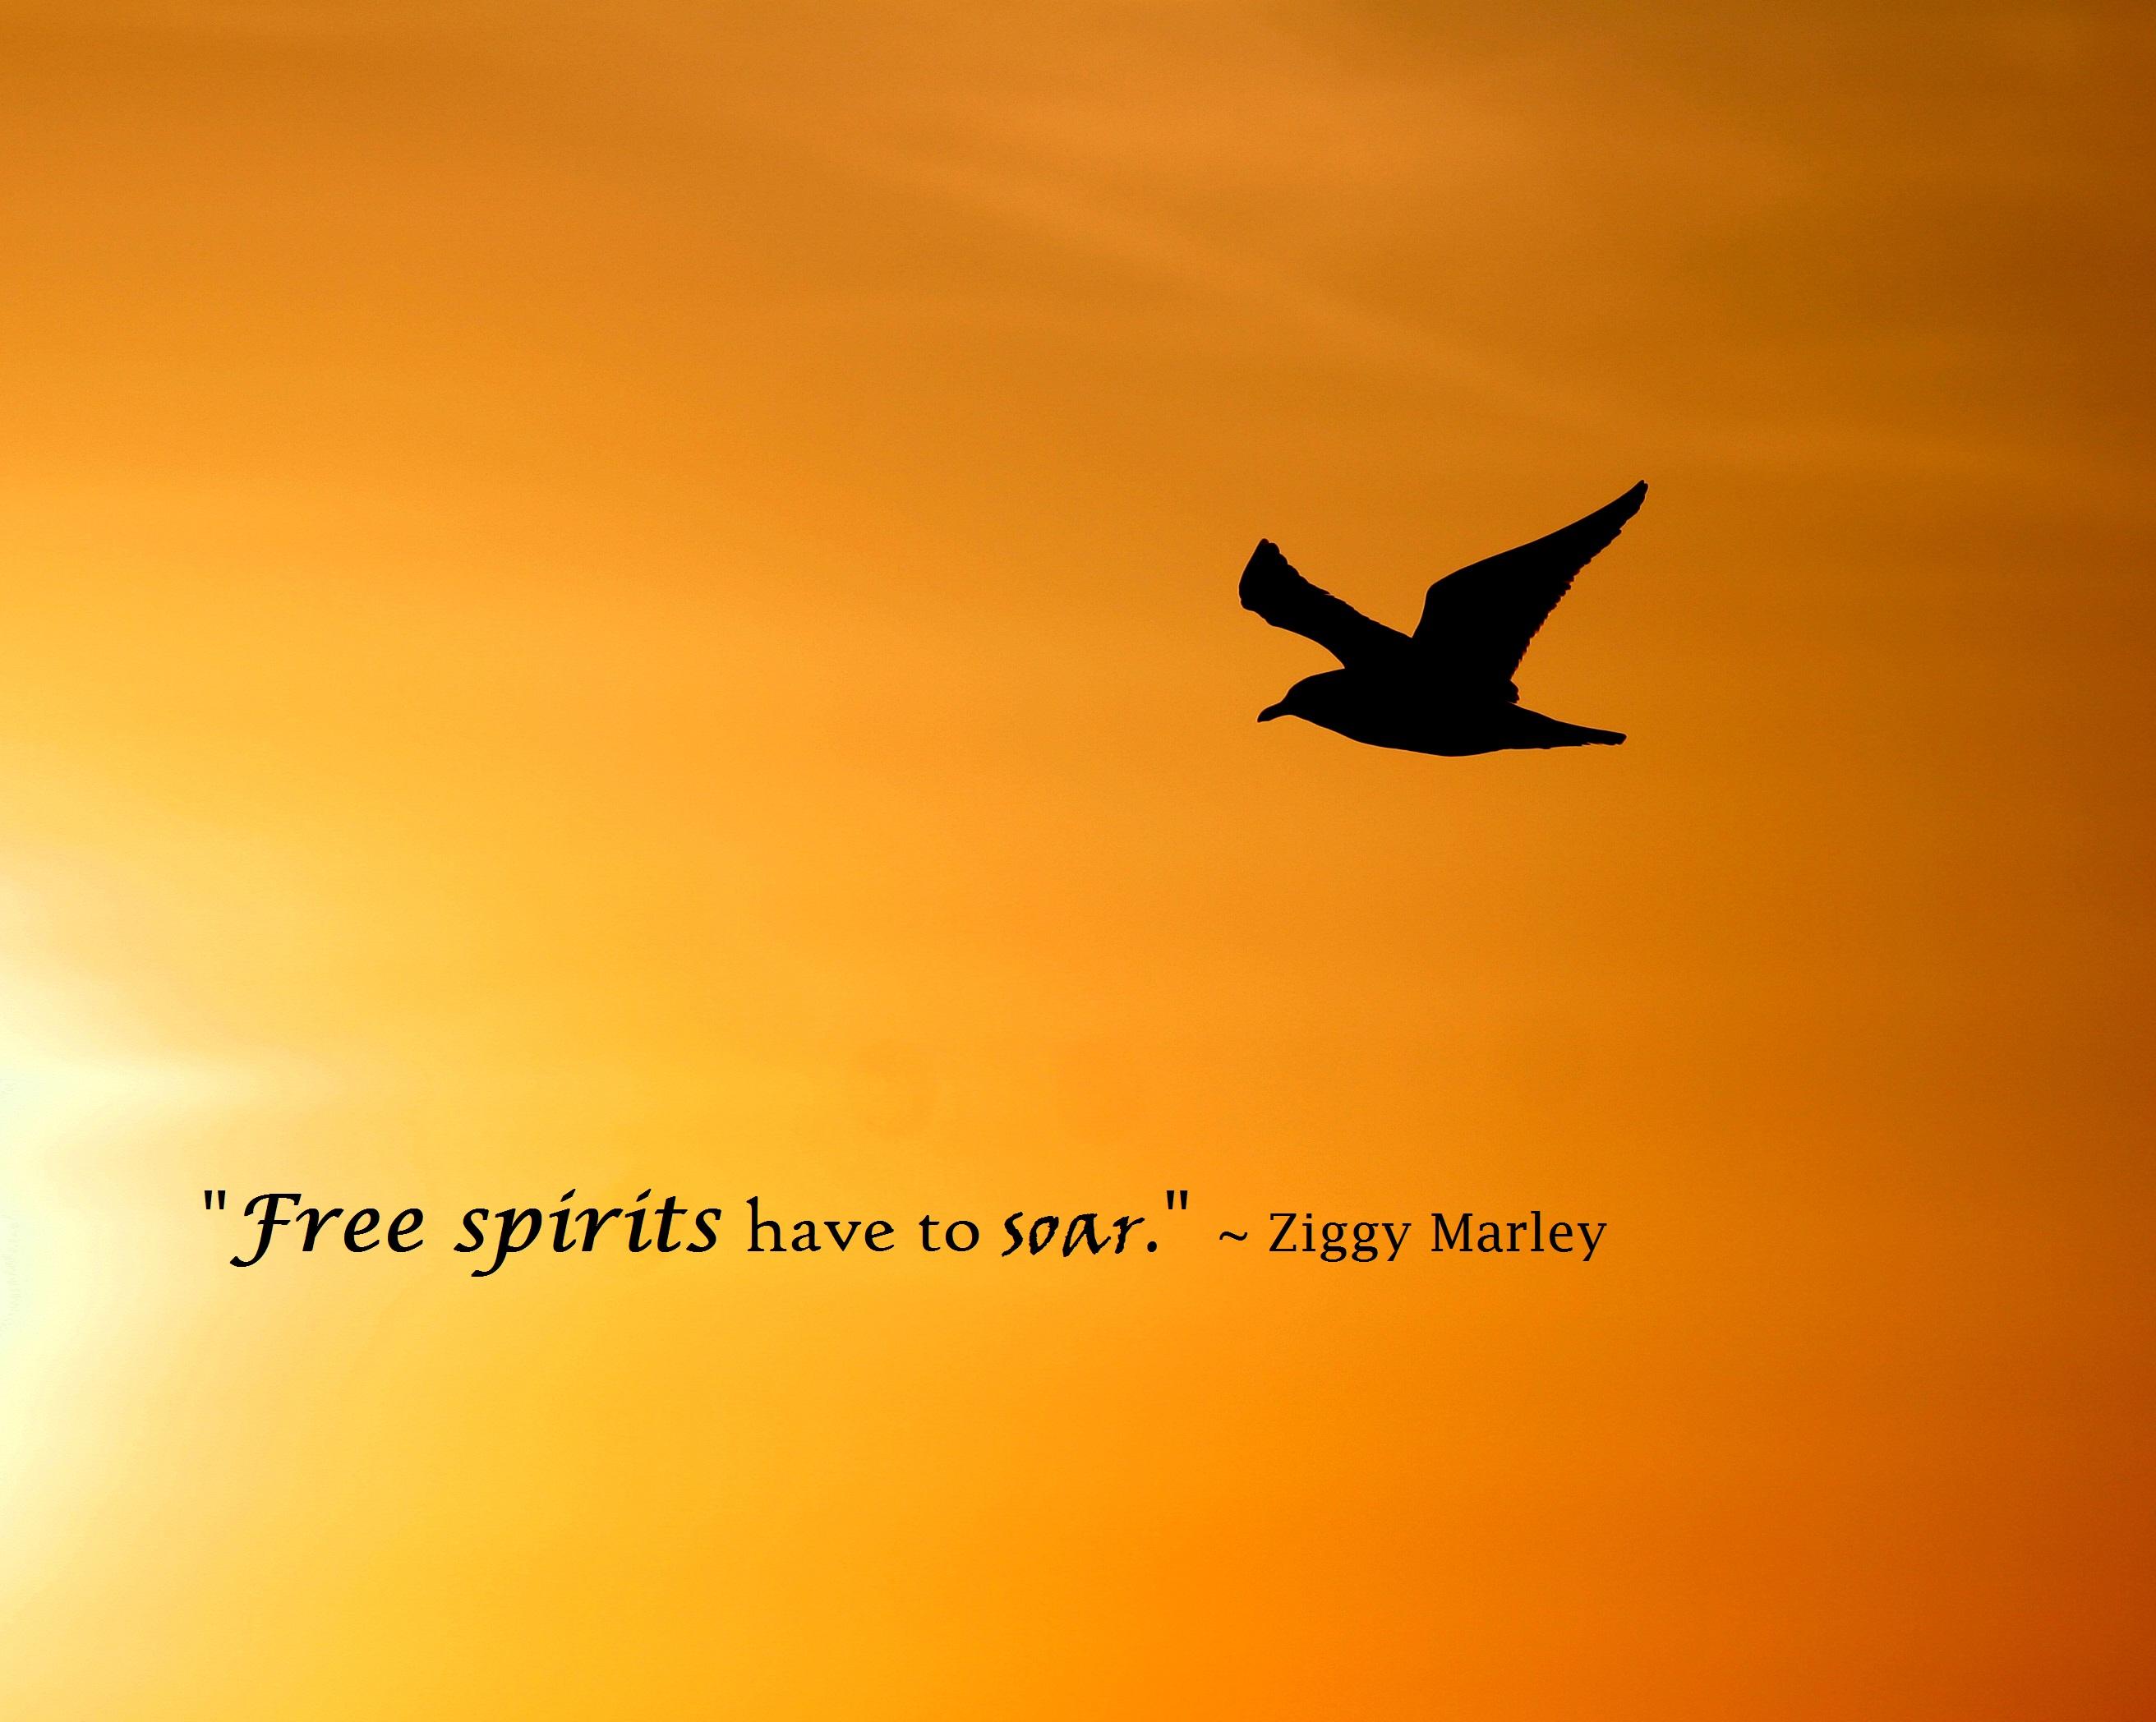 Ziggy Marley's quote #6